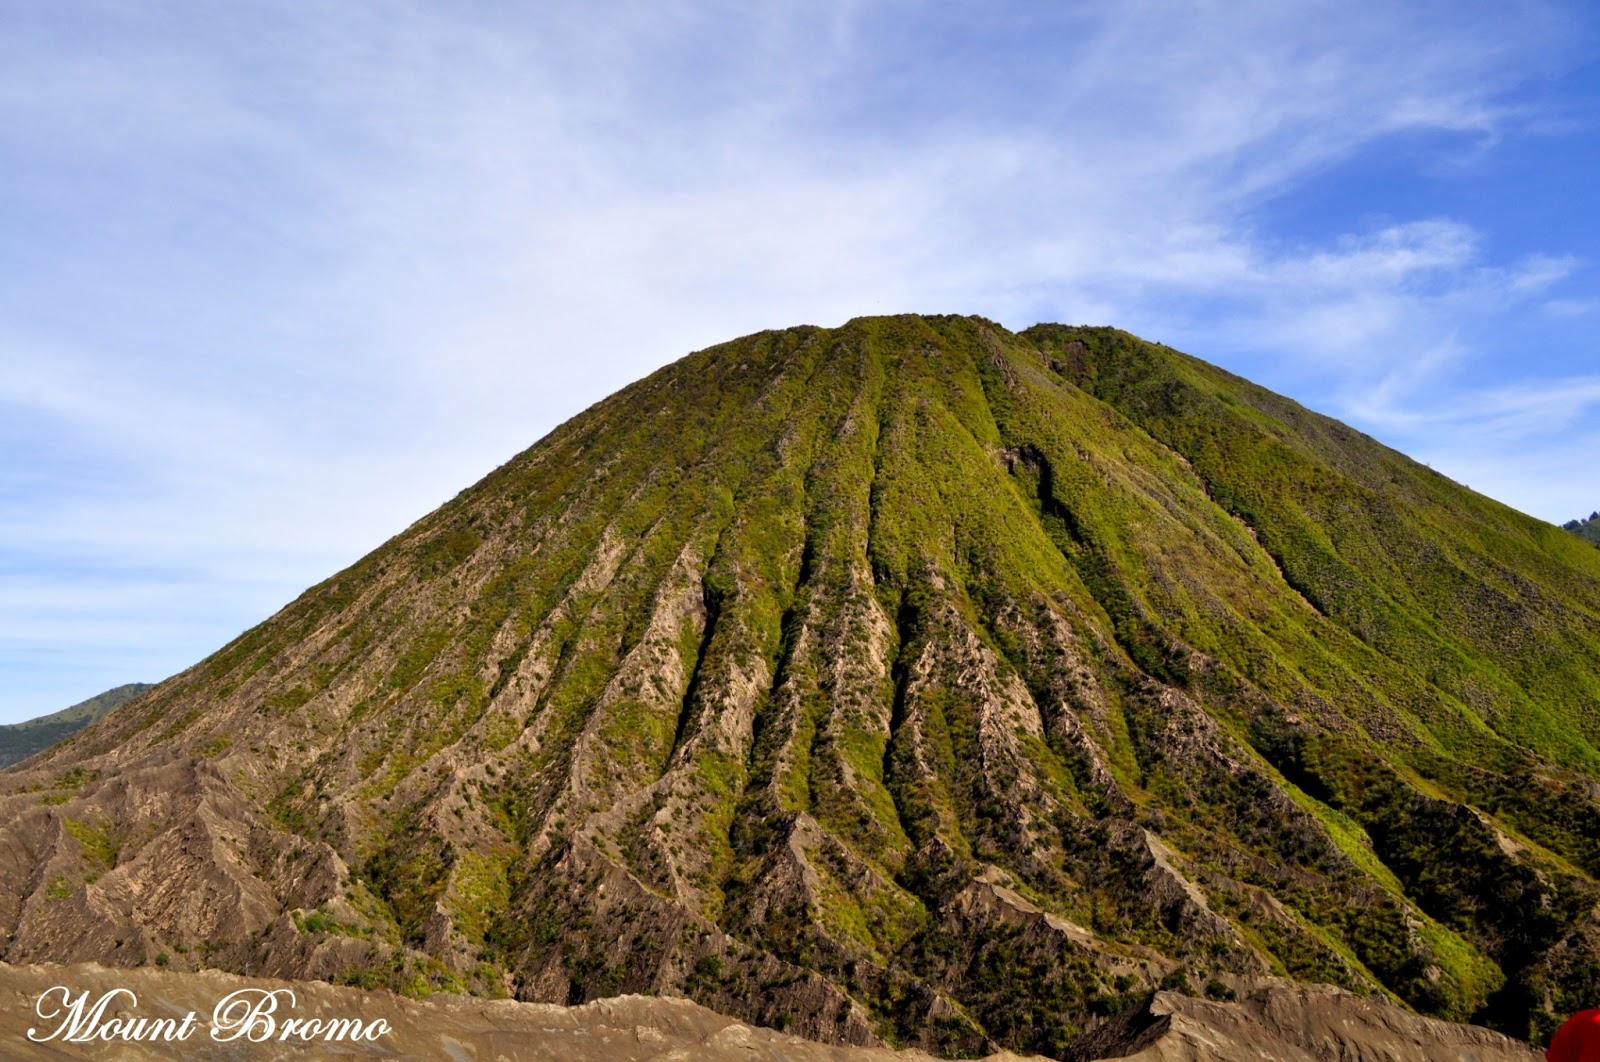 Probolinggo Indonesia  City new picture : Never Give Up!: Mount Bromo, East Java, Probolinggo, Indonesia